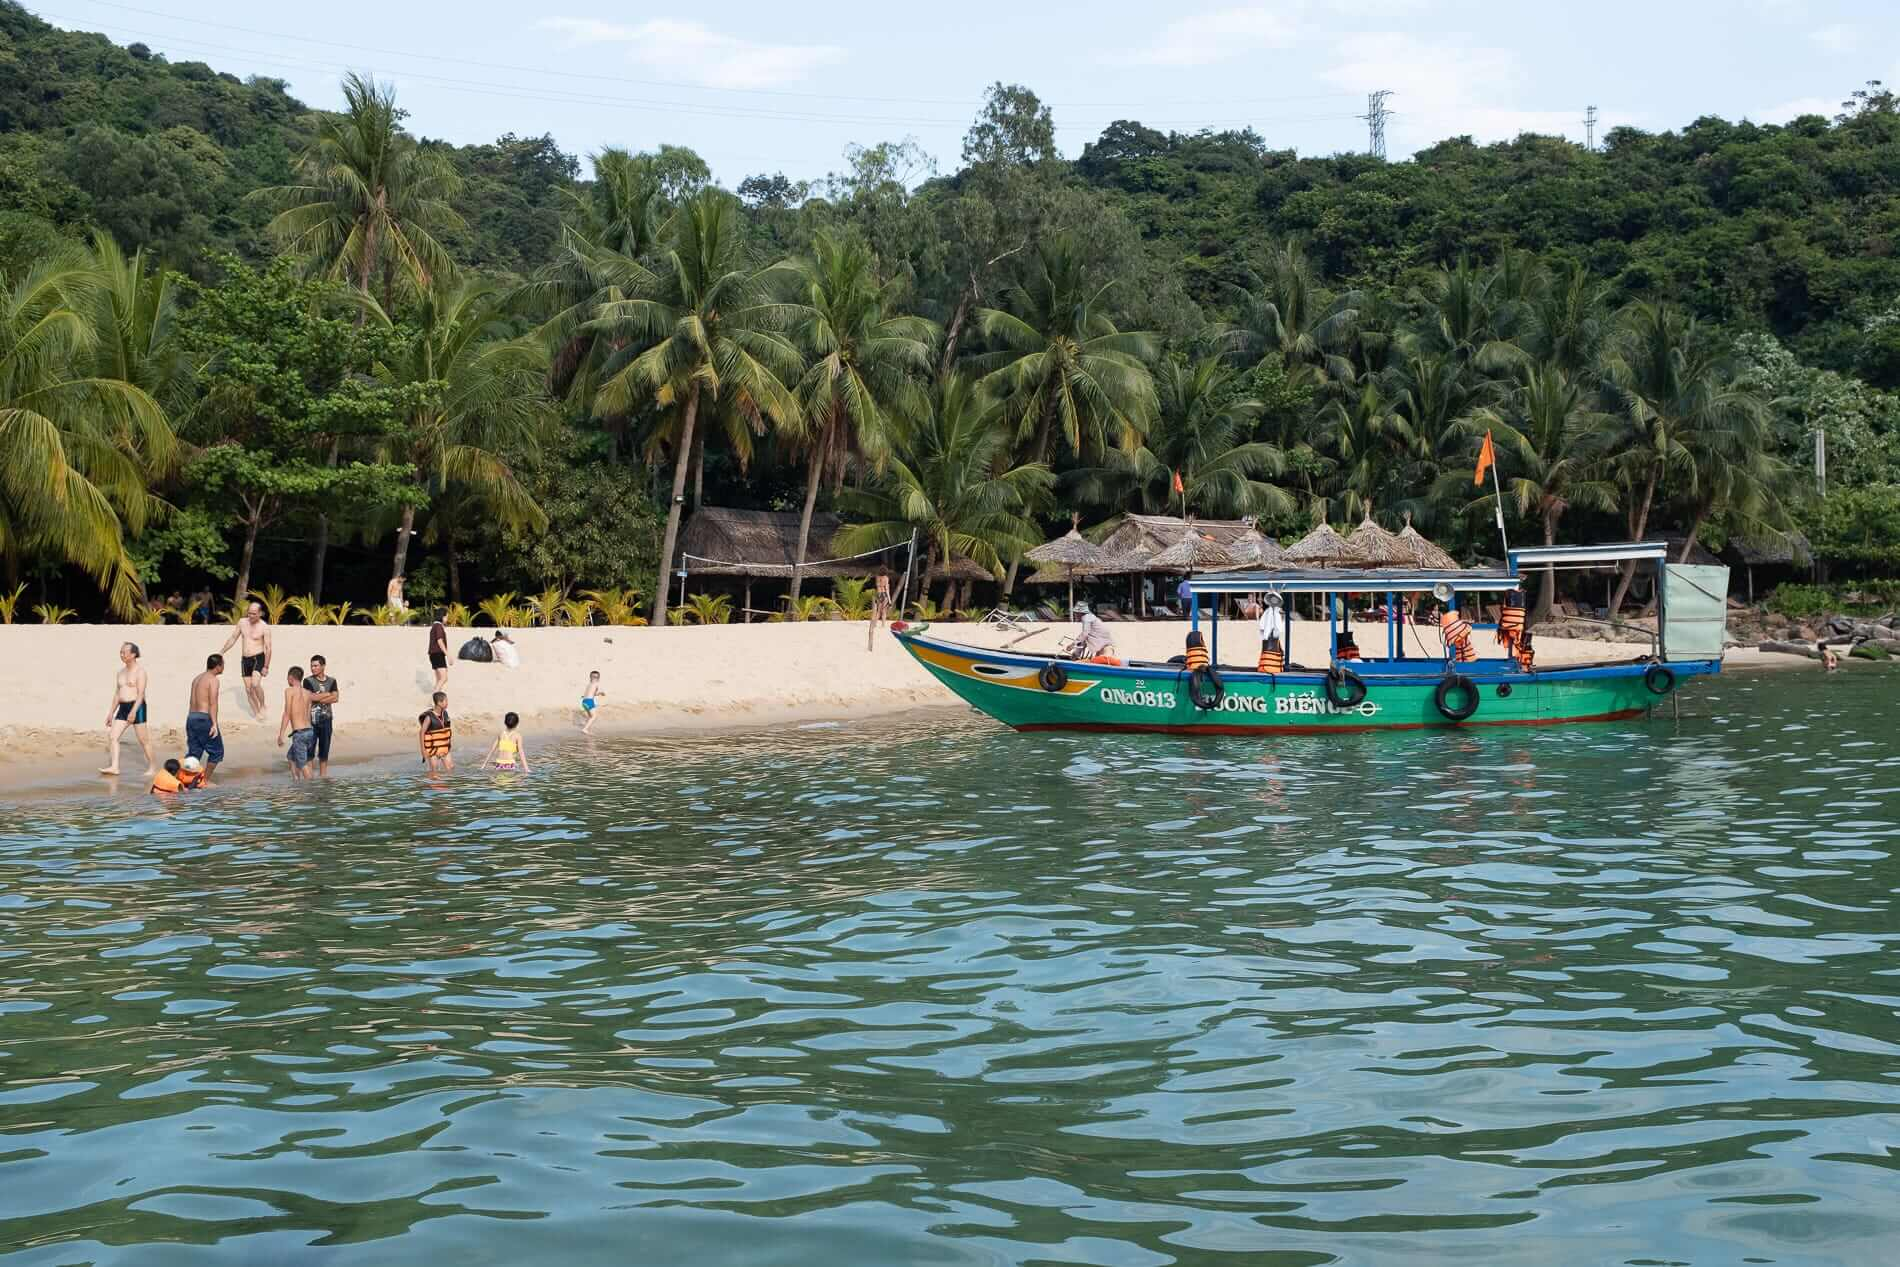 Passengers drop off to Bai Chong Beach - Cham Islands Accommodation